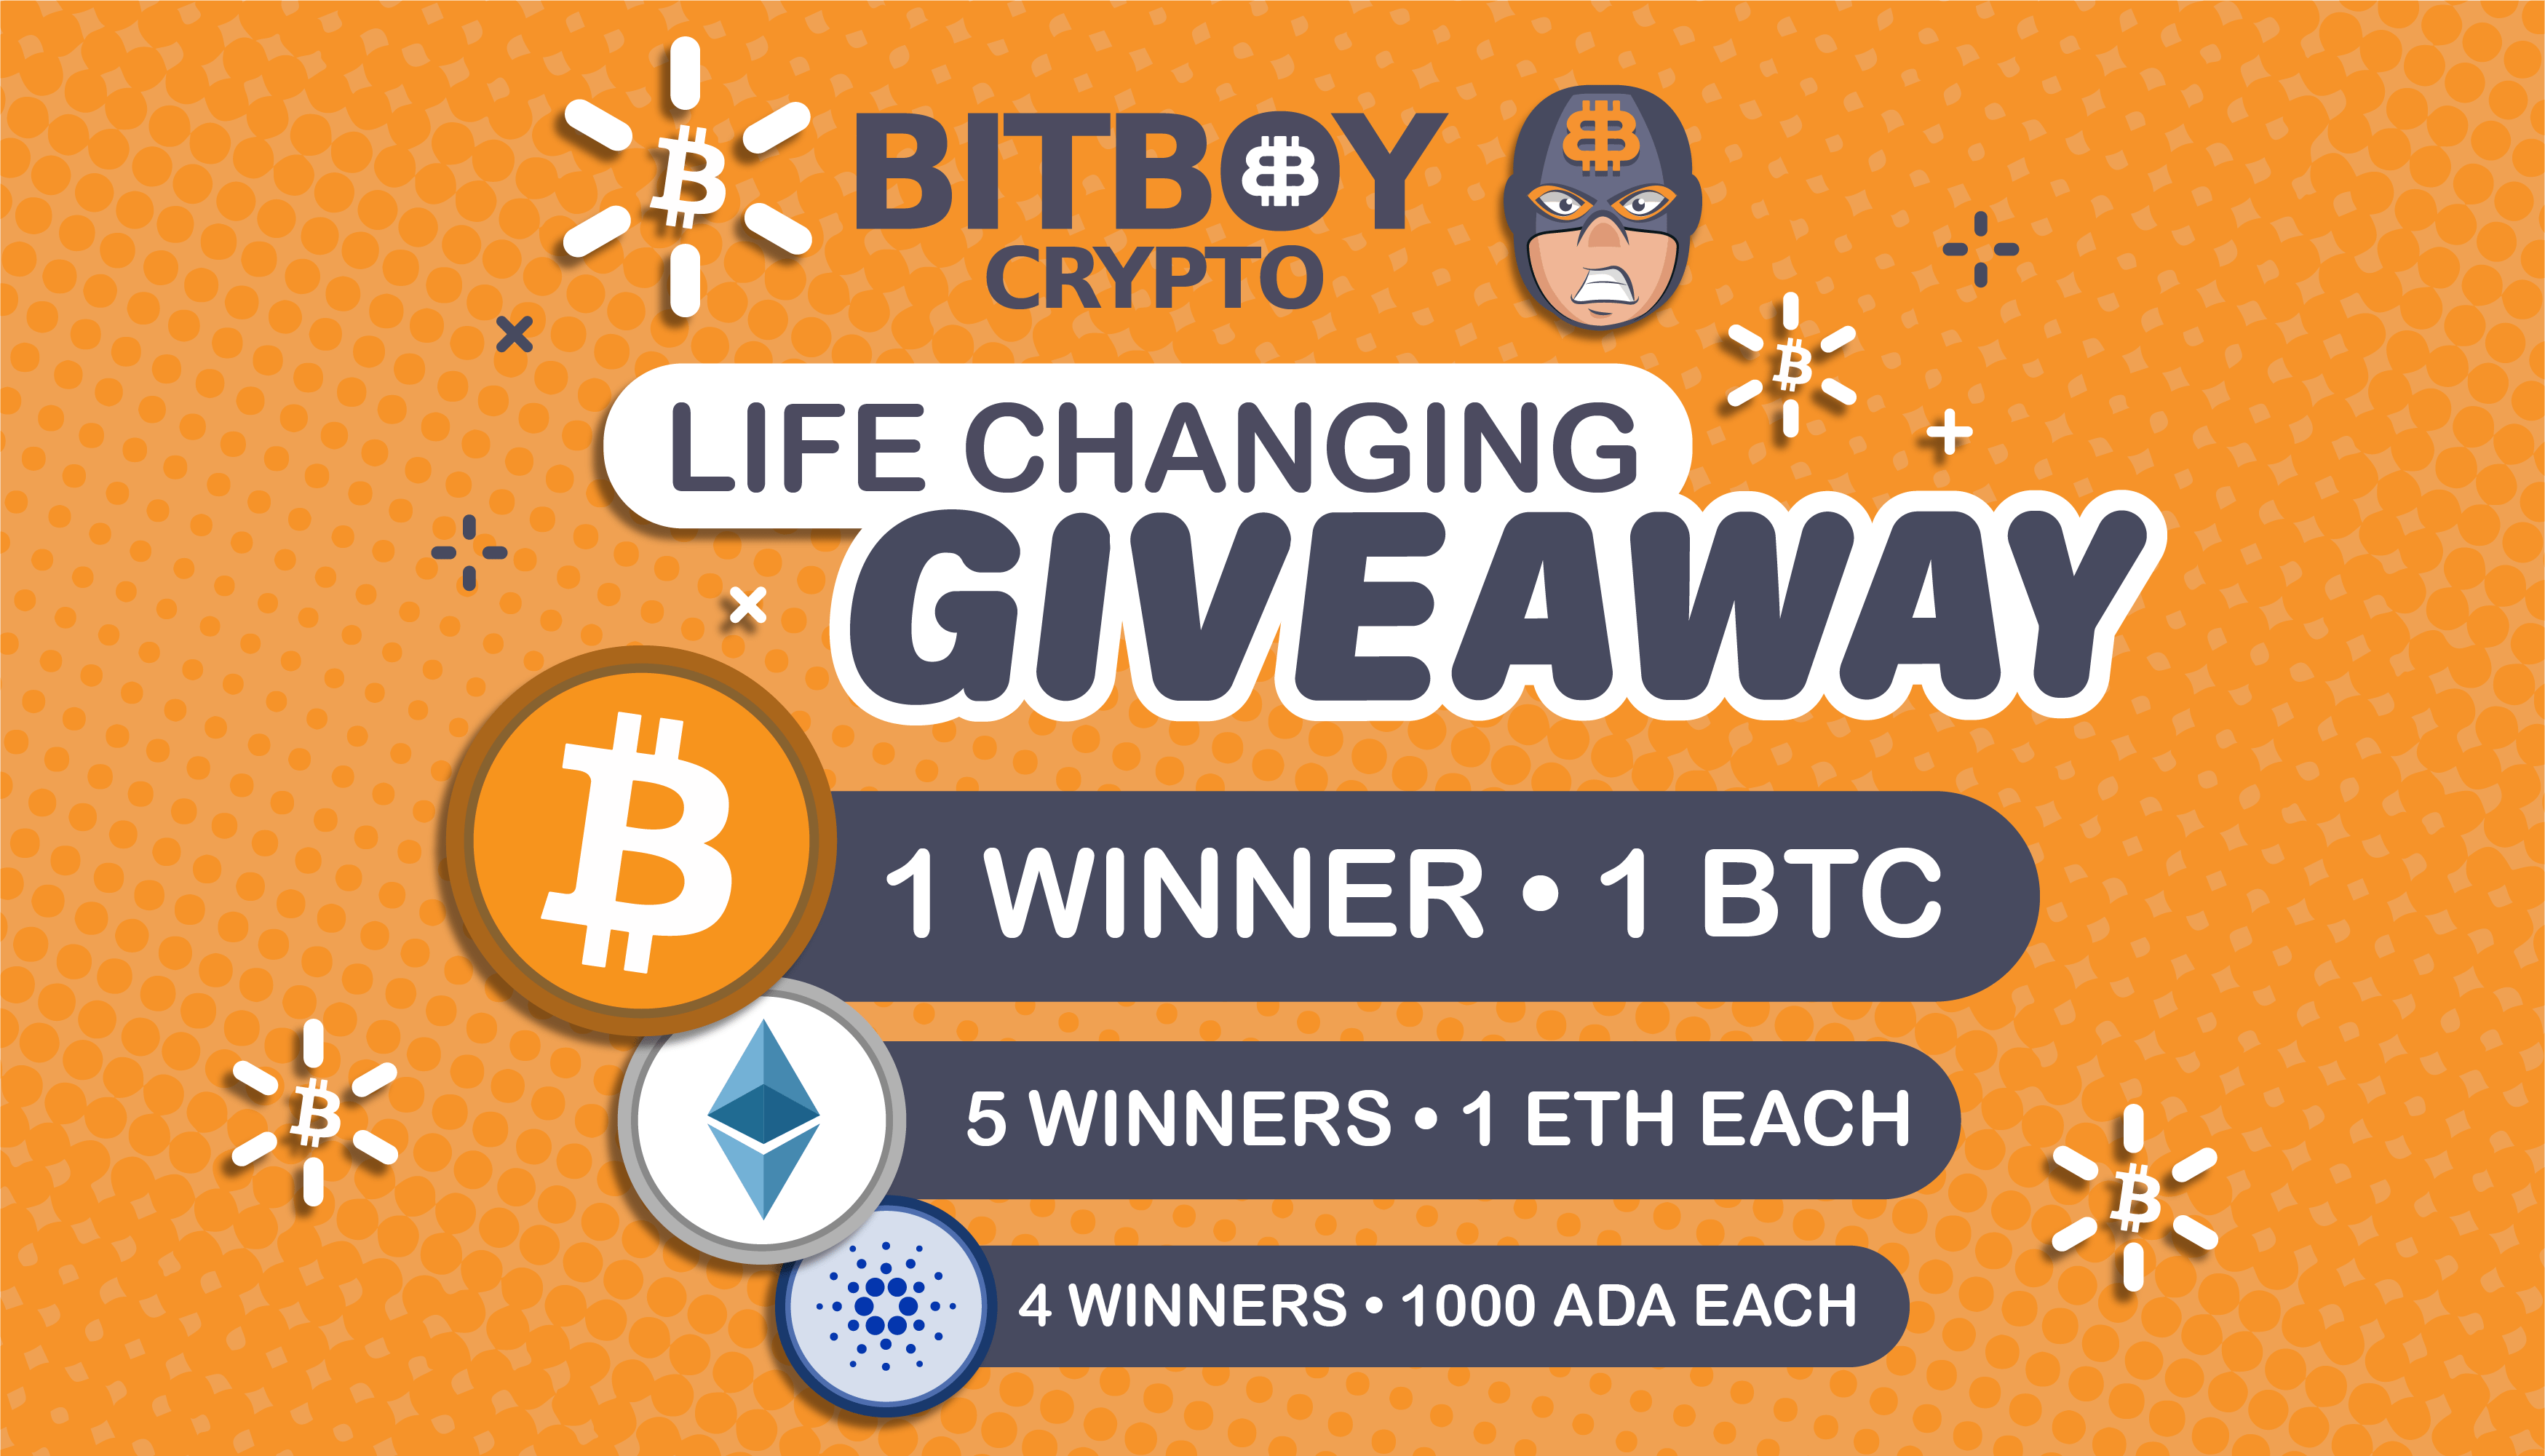 bitcoin giveaway 2021